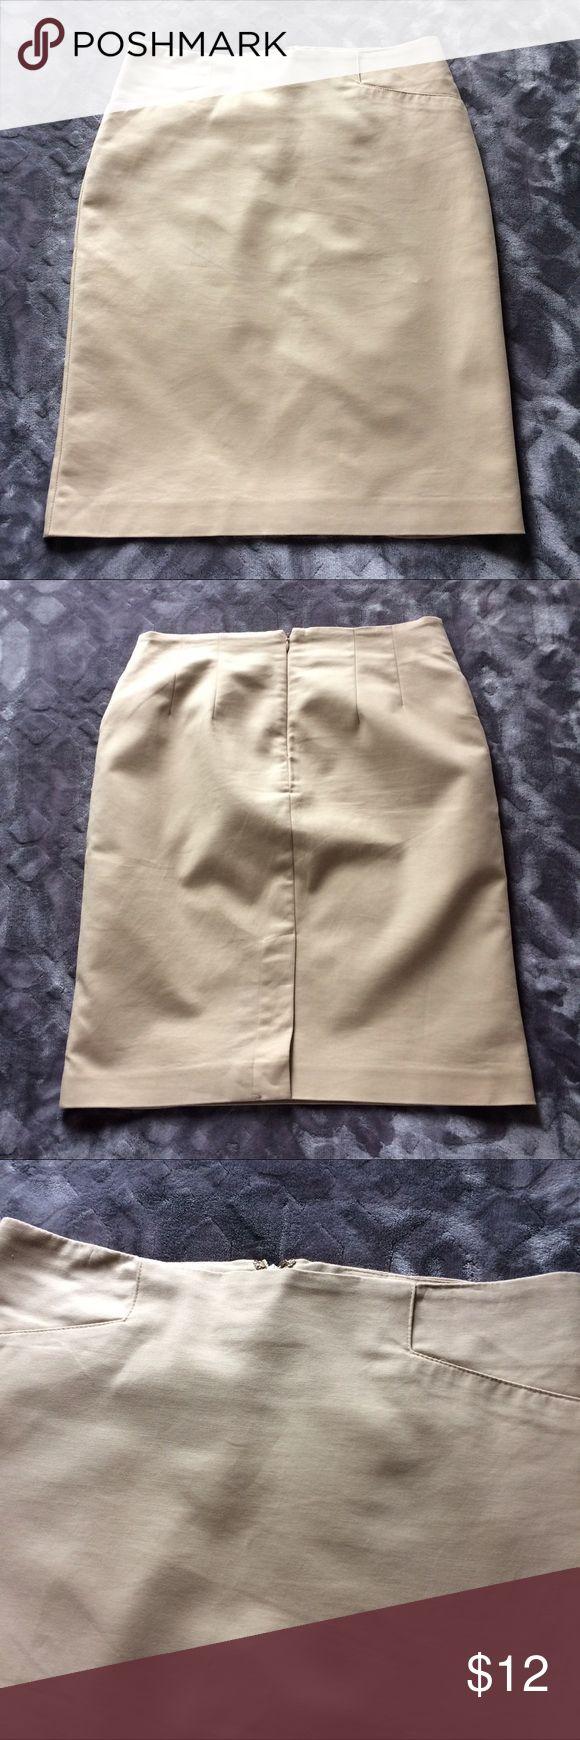 Women's khaki pencil skirt Classic khaki pencil skirt. Worn only a few times. Good condition. VanHeusen Skirts Pencil